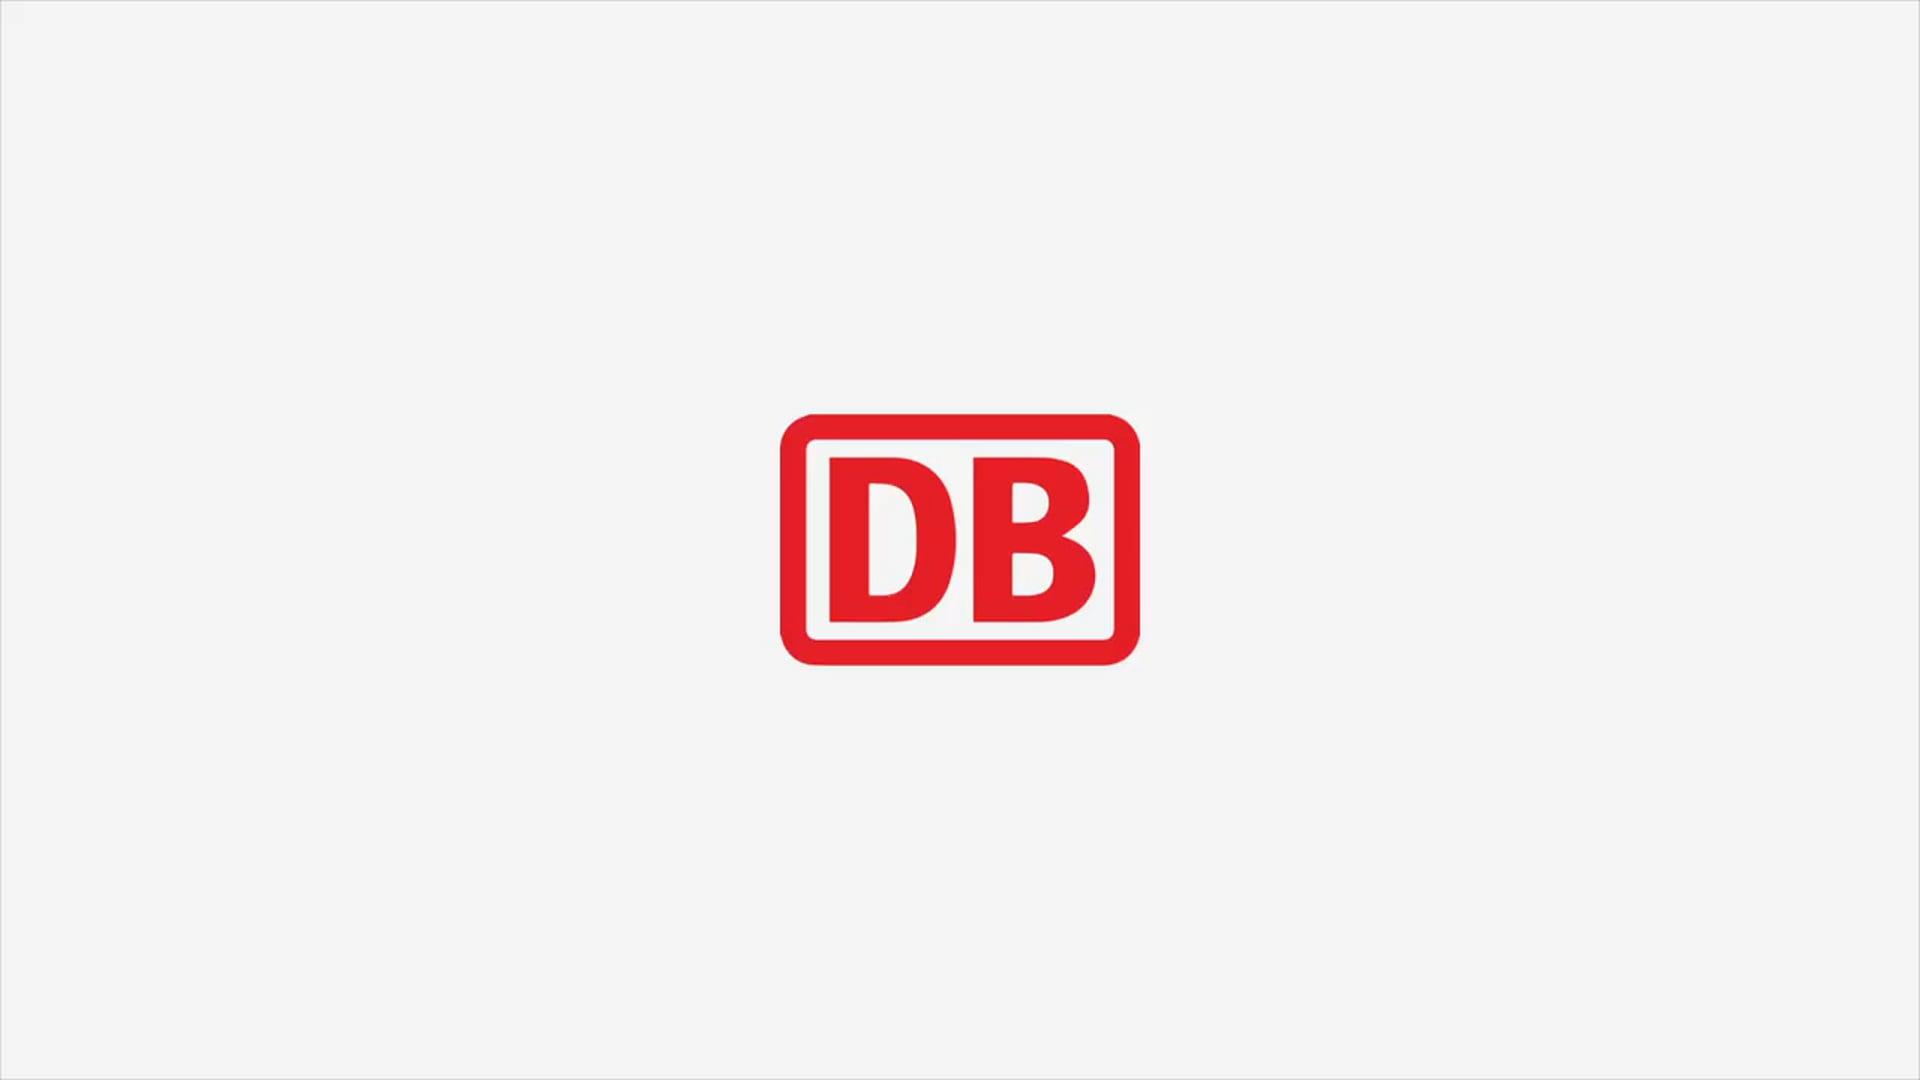 Image Film: Deutsche Bahn